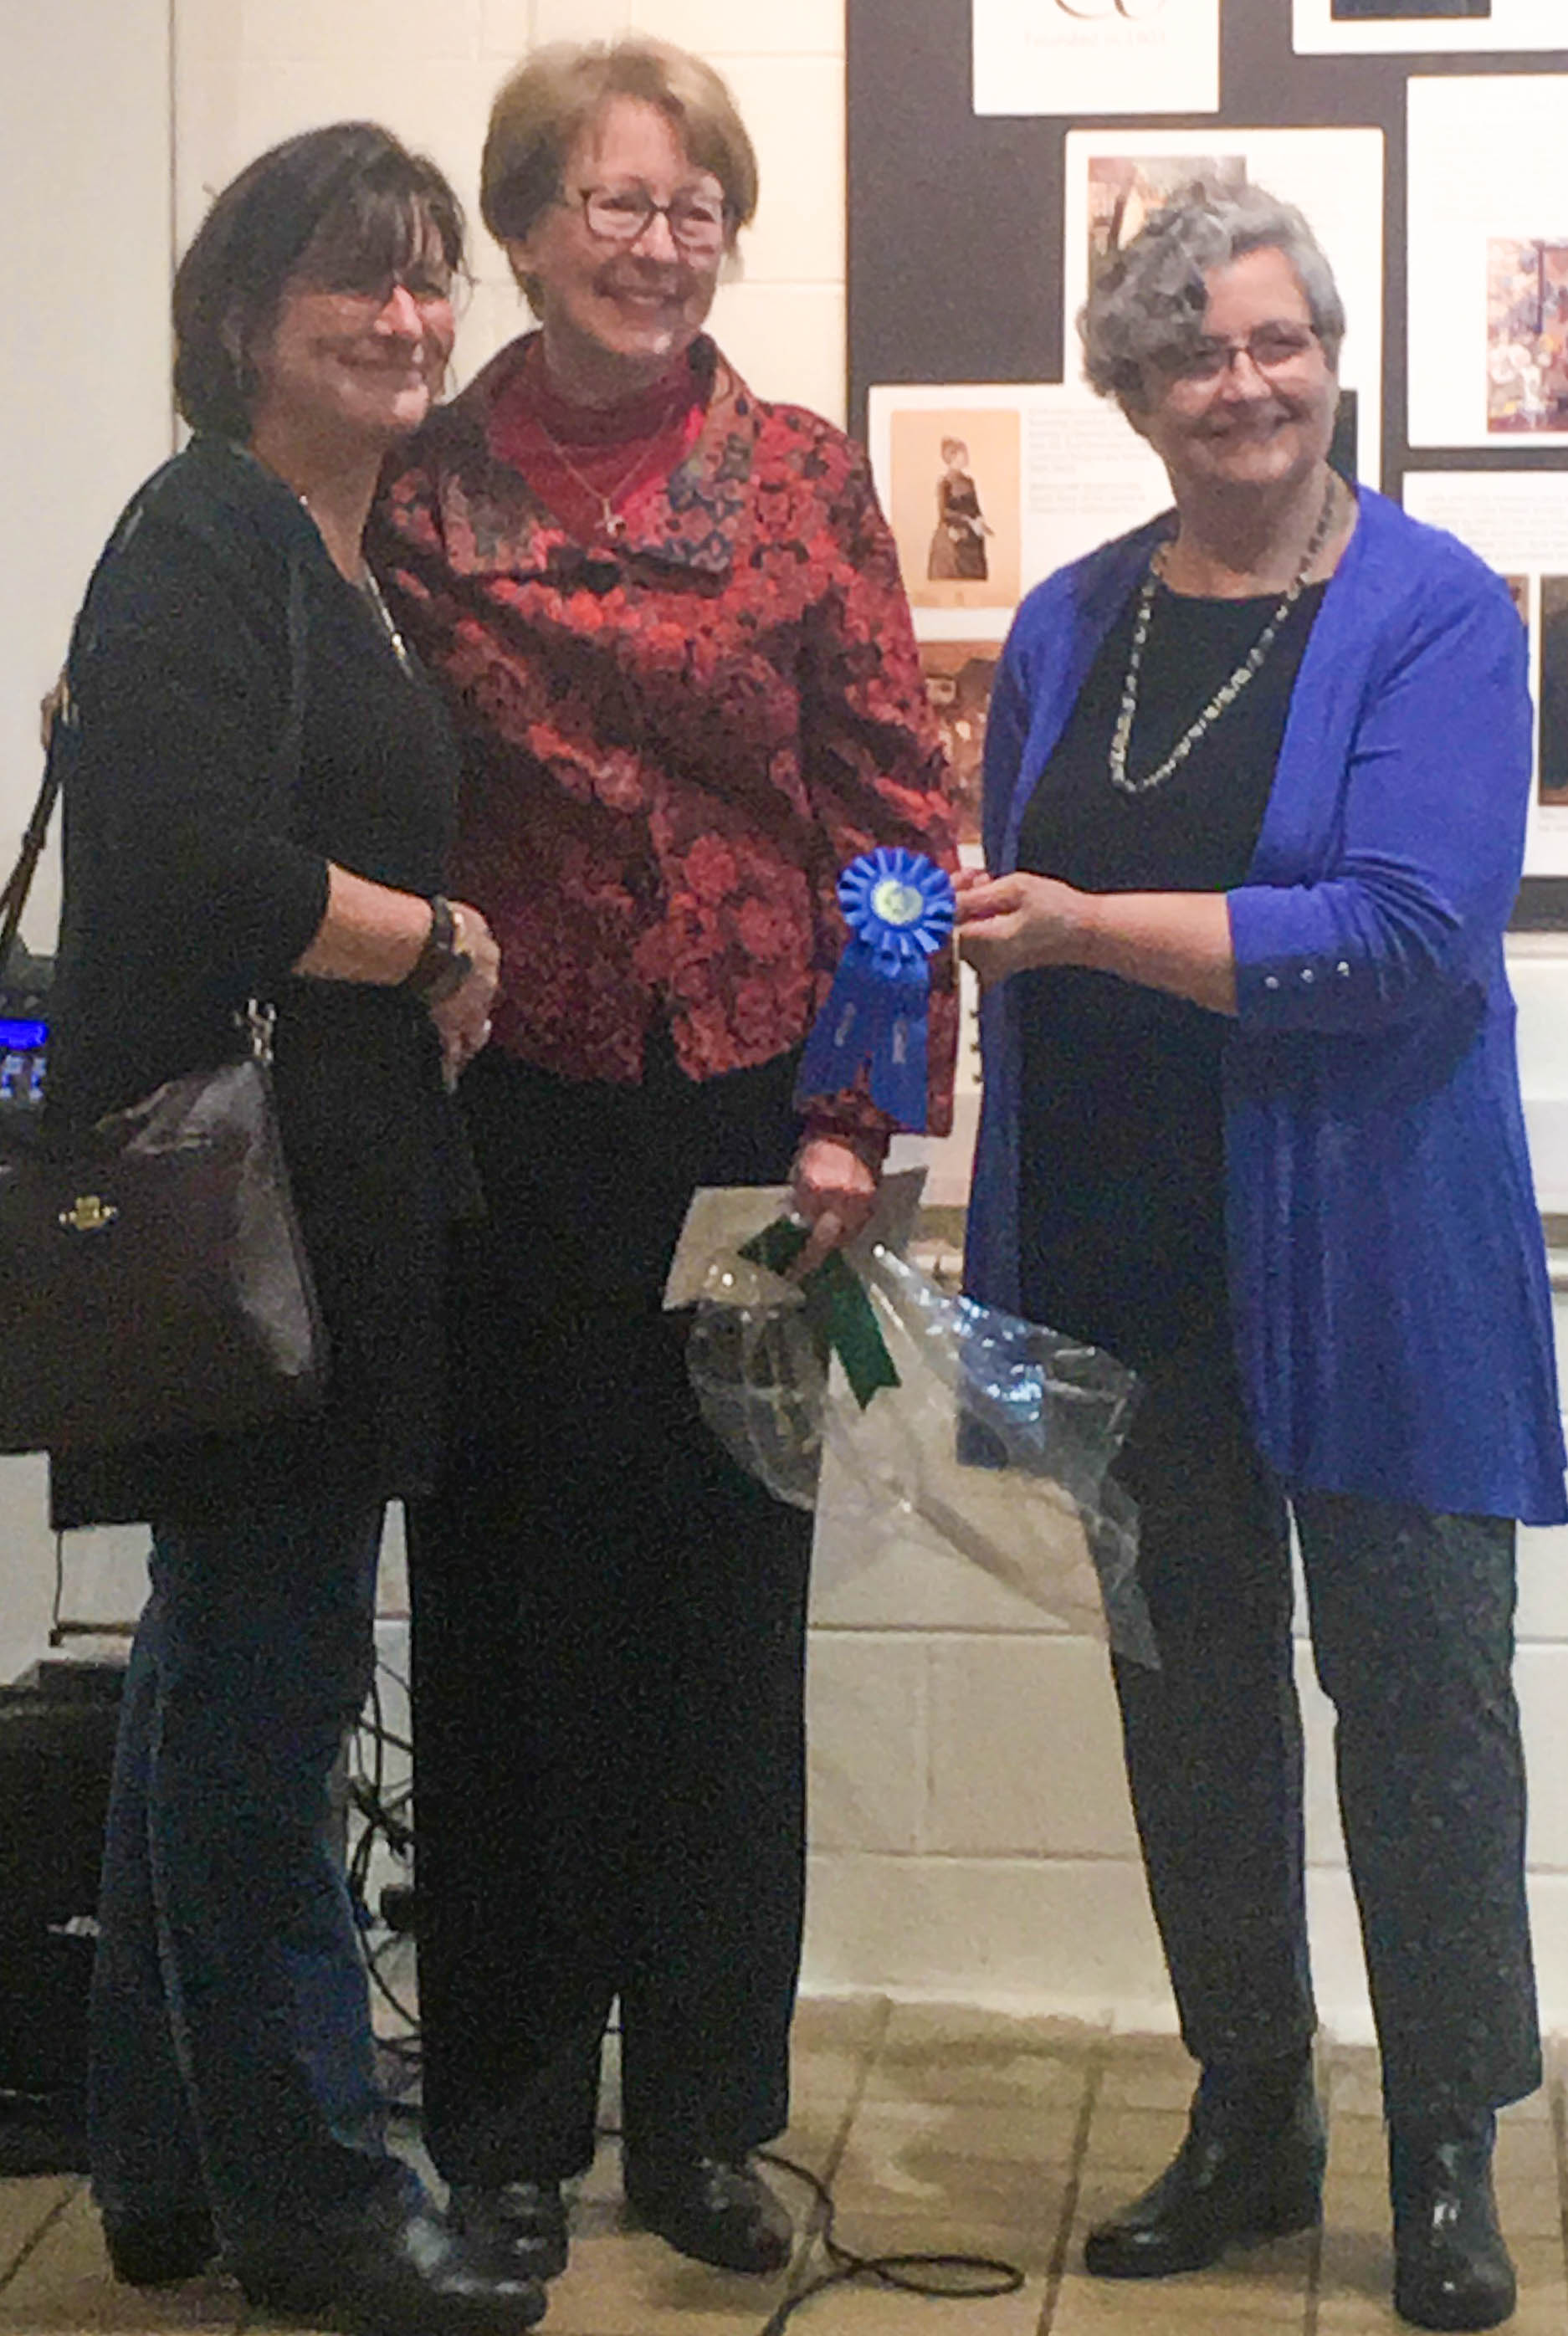 Beth Brown, Kathleen O'Connell, Joan Smykowski